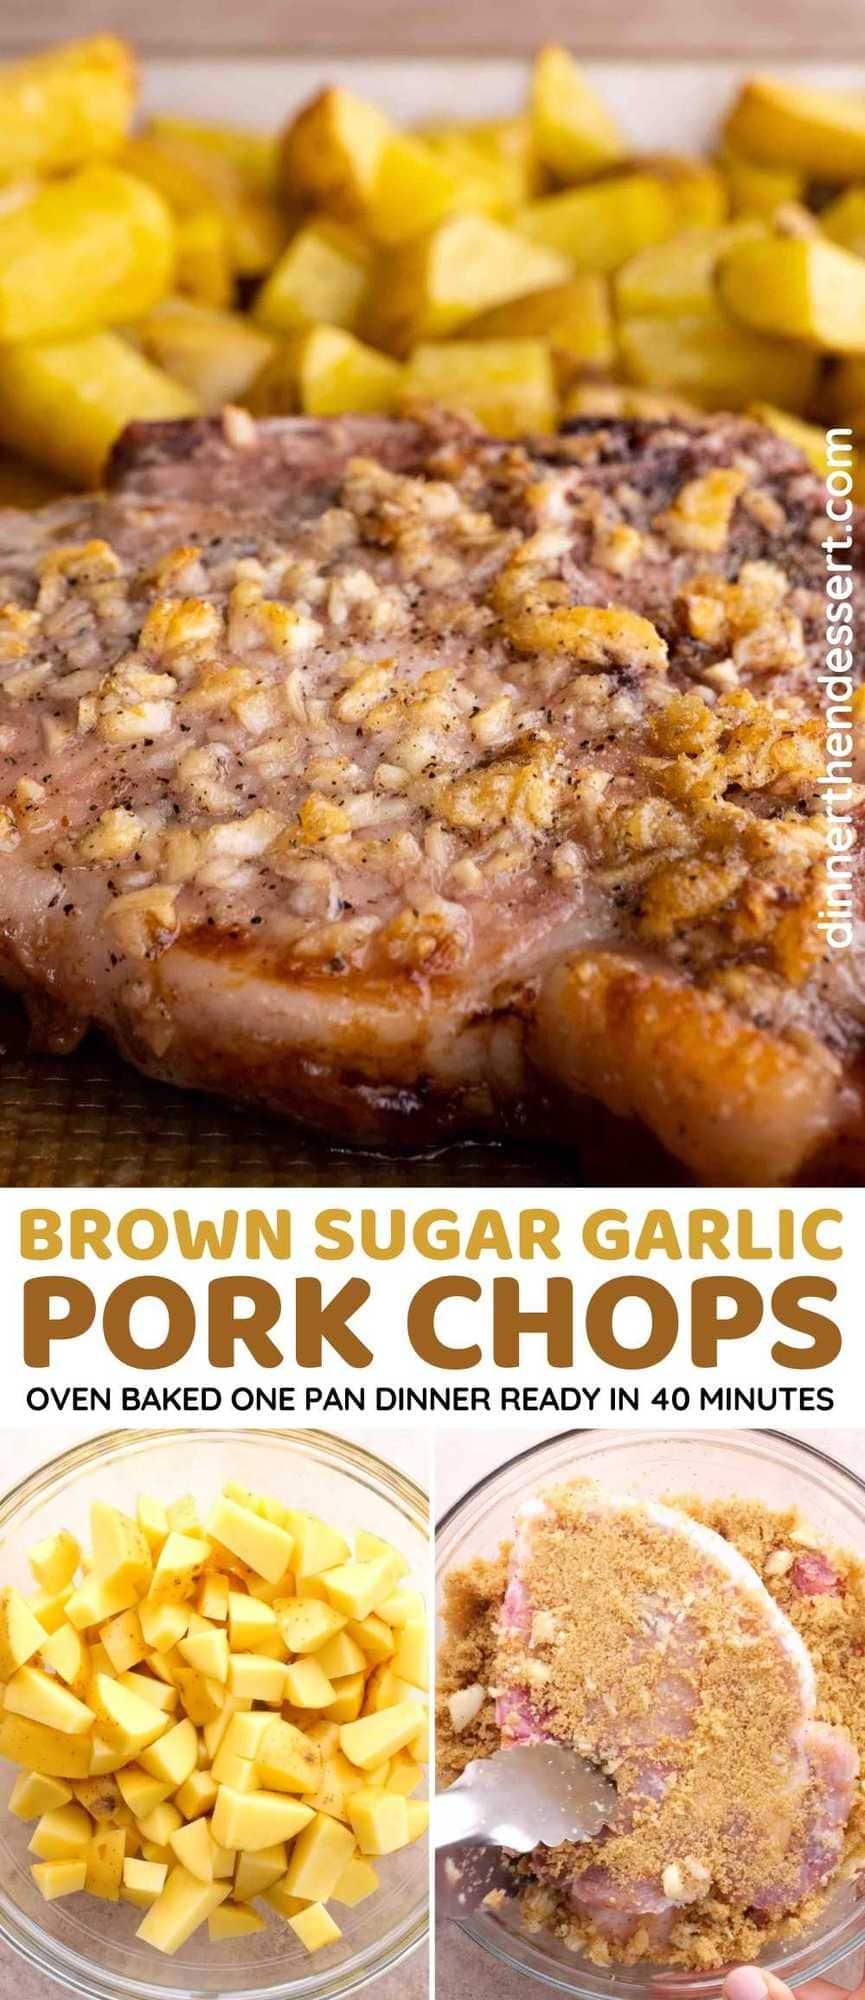 Brown Sugar Garlic Oven Baked Pork Chops Collage